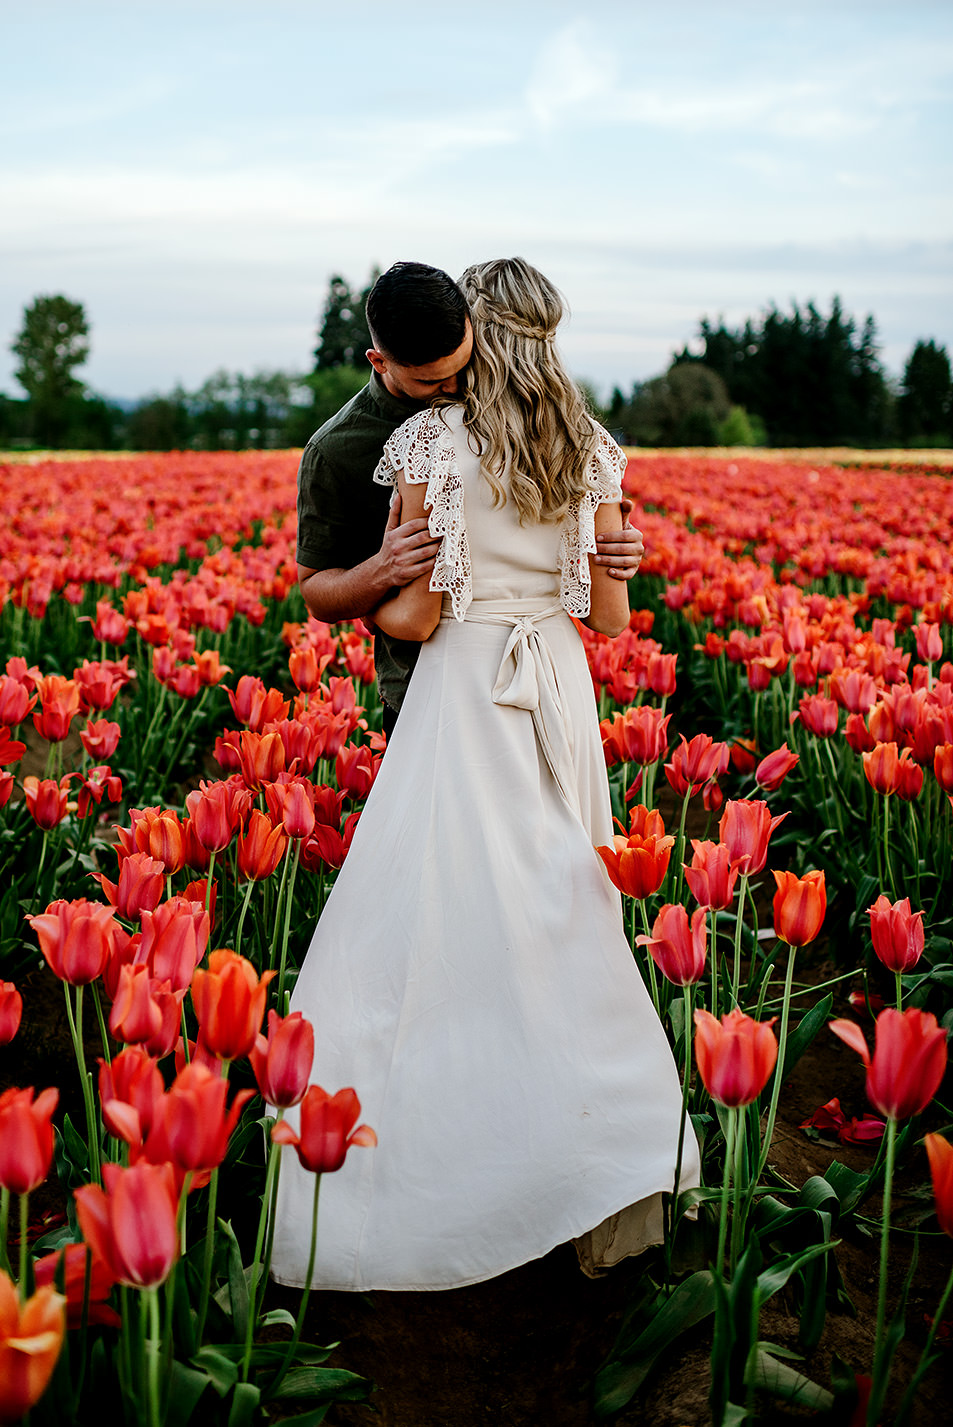 Tulip-field-engagement-session-Portland-Photographer-37.jpg